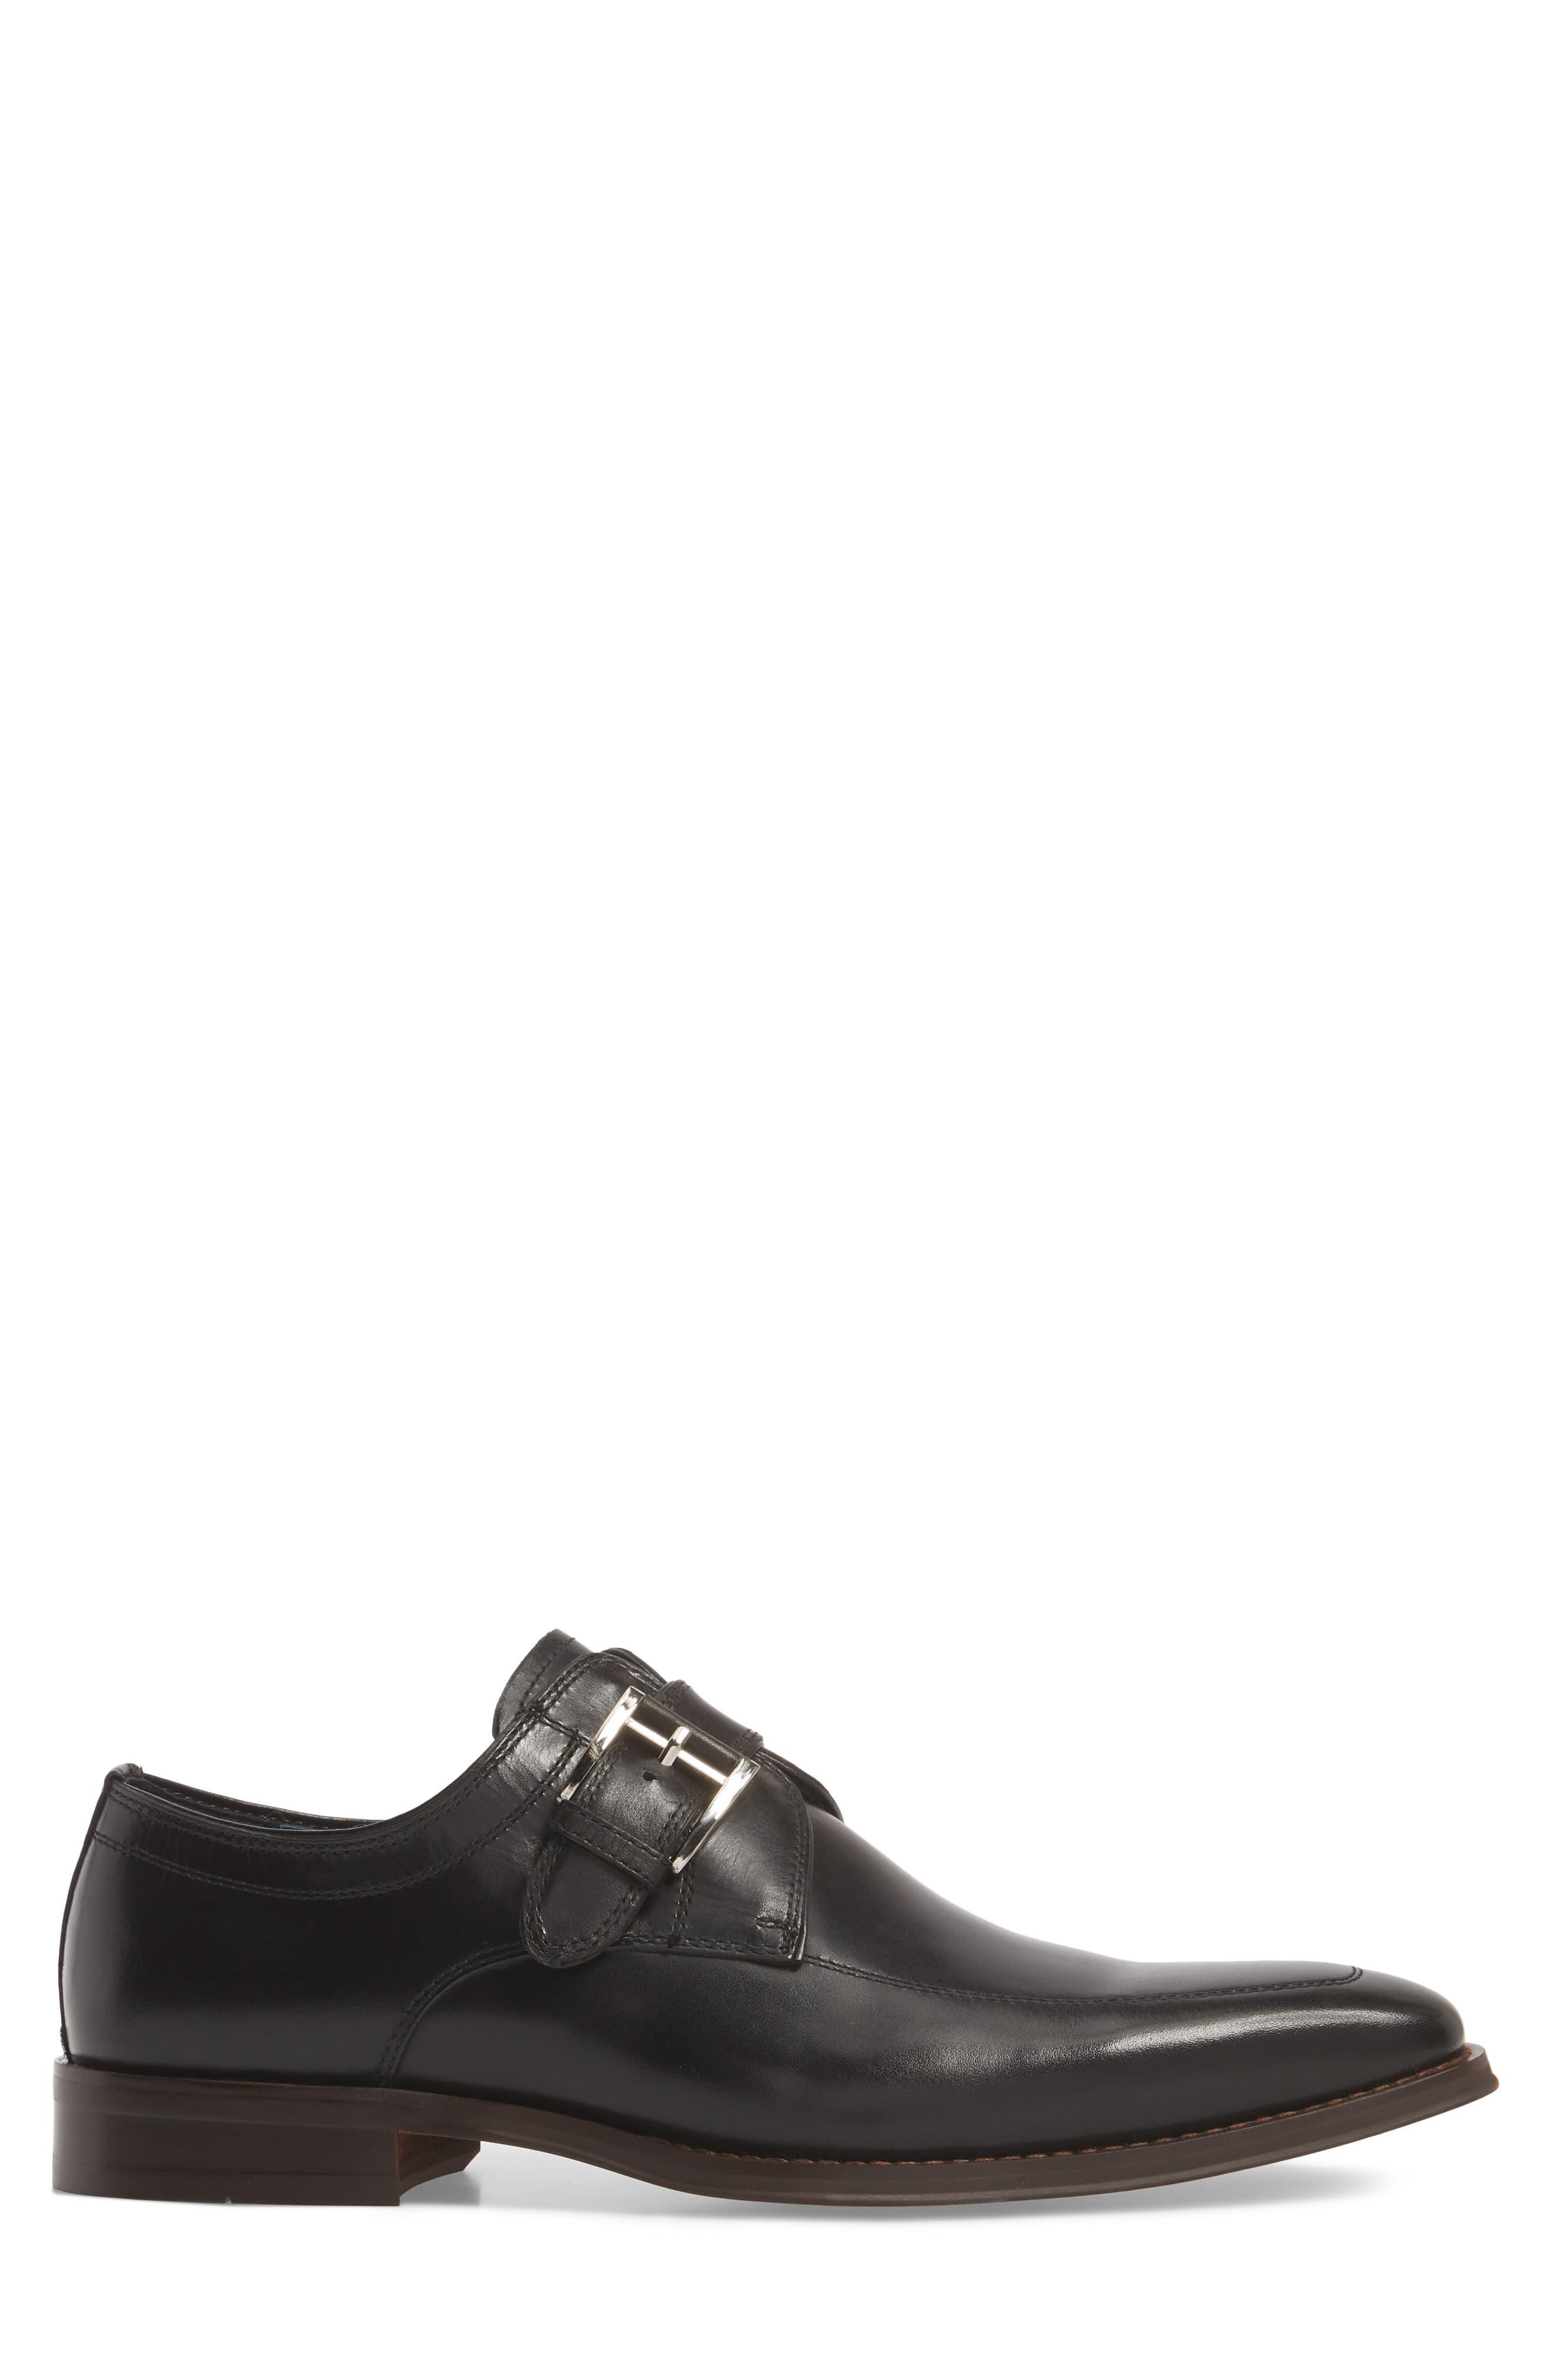 Merlot Single Buckle Monk Shoe,                             Alternate thumbnail 3, color,                             BLACK LEATHER